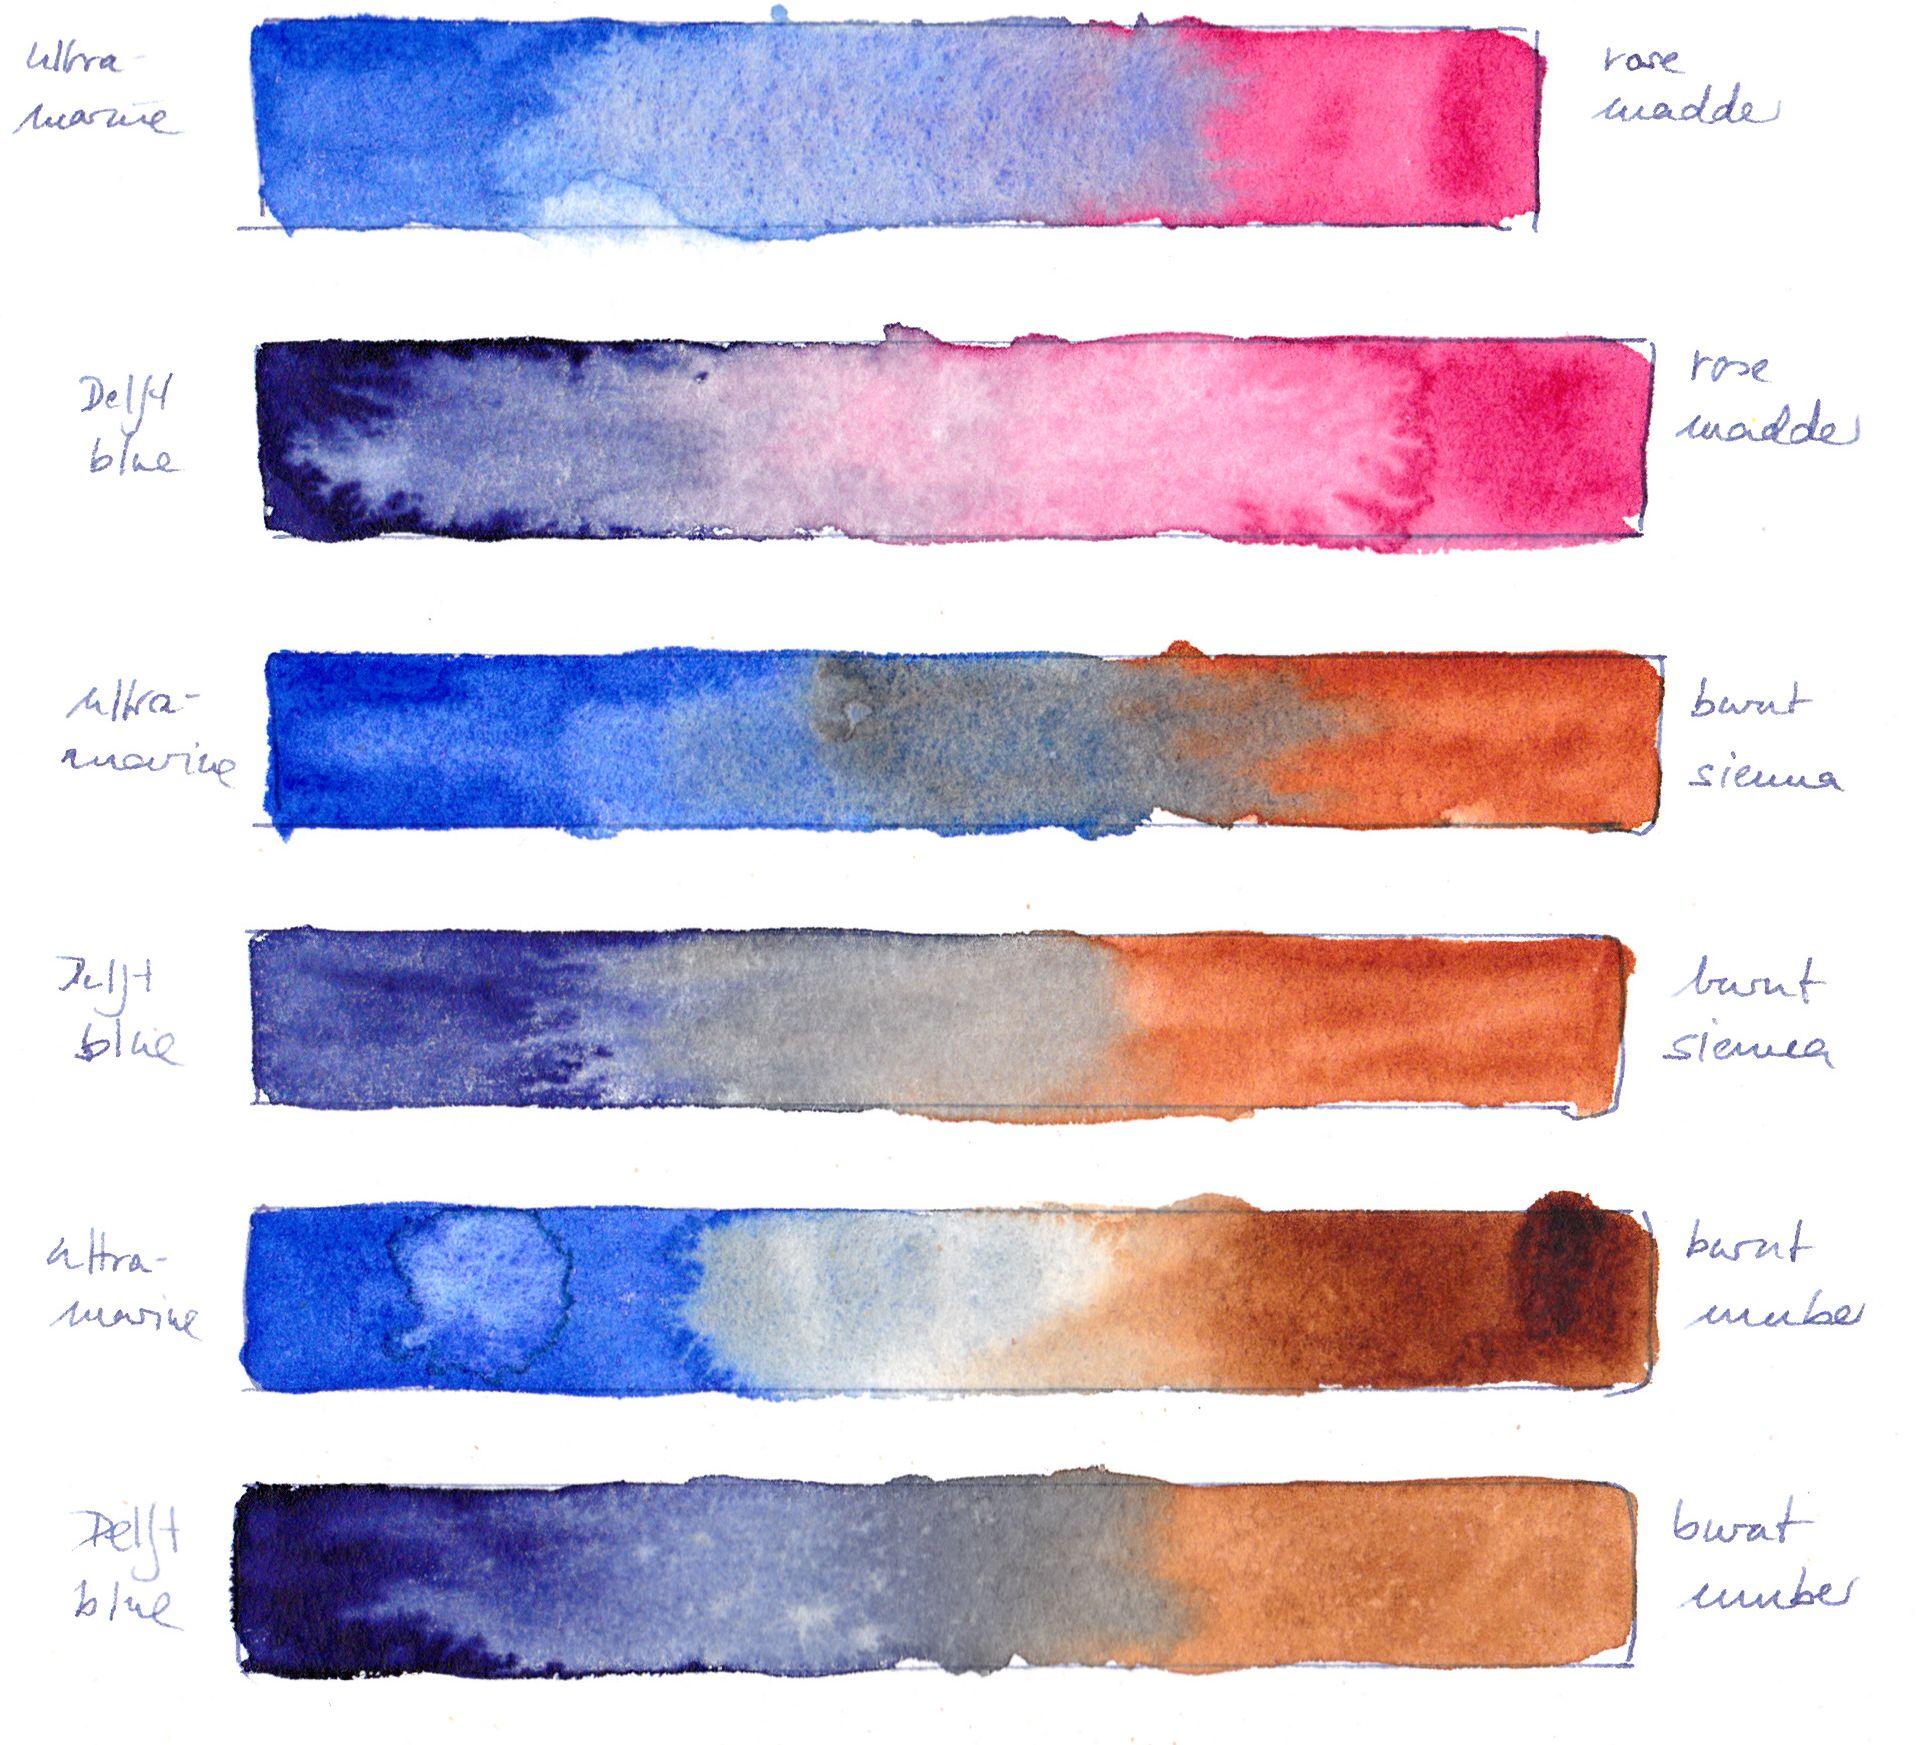 colourchart_1_1